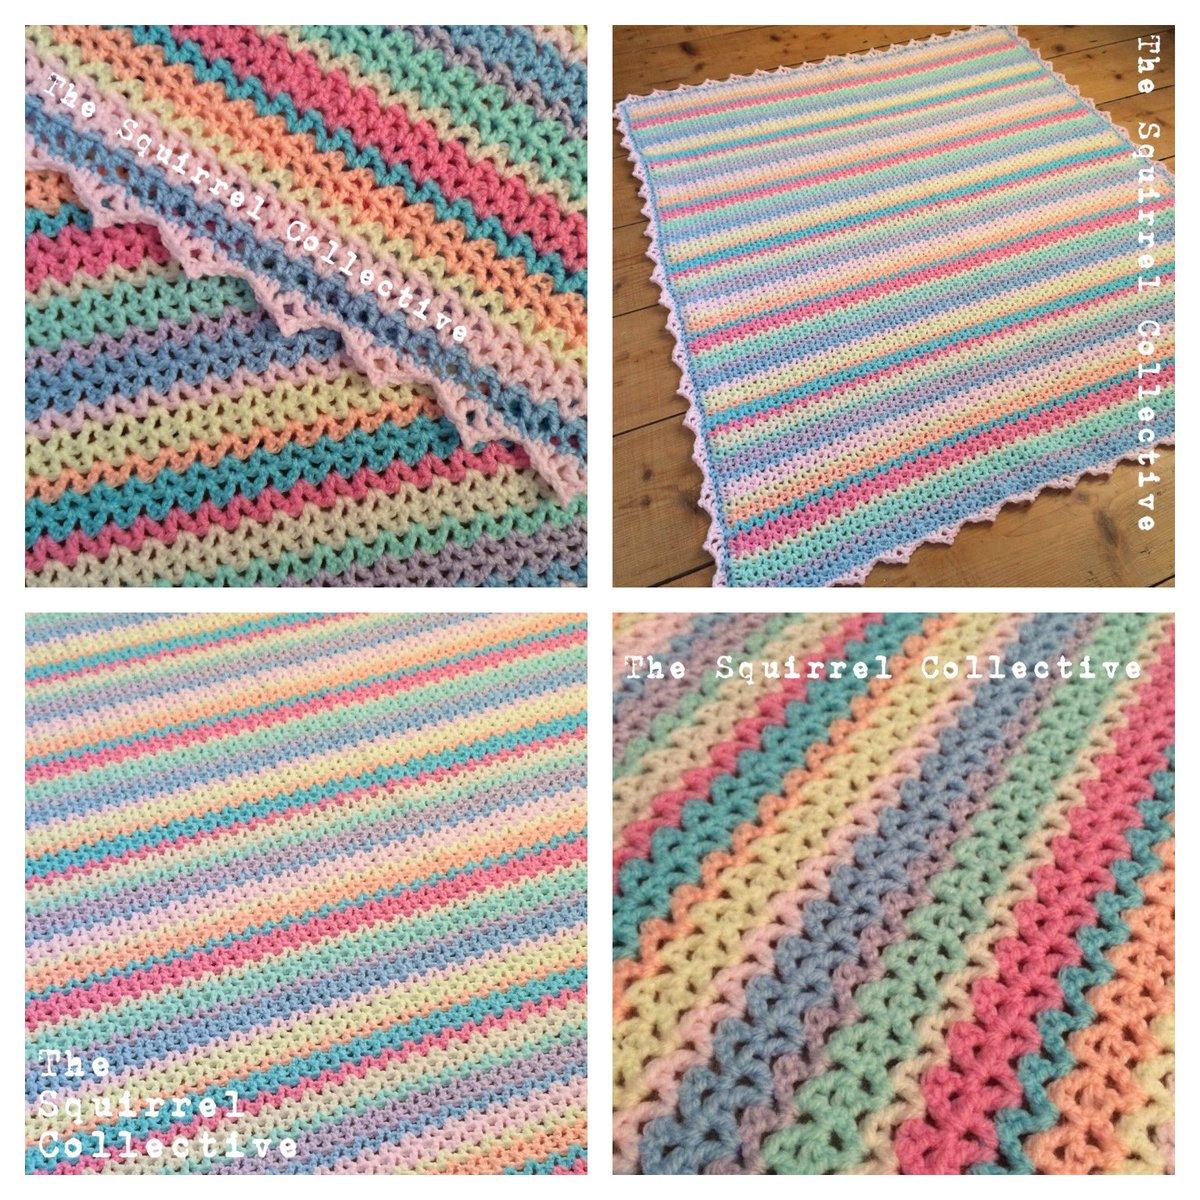 It&#39;s not #dragon, it&#39;s #unicorn!  https://www. facebook.com/TheSquirrelCol lective/posts/1765322837130984:0 &nbsp; …  #crafthour #crochet #blanket #handmade #handmadehome #newbaby #WAHM<br>http://pic.twitter.com/Jw7ljxeoA5